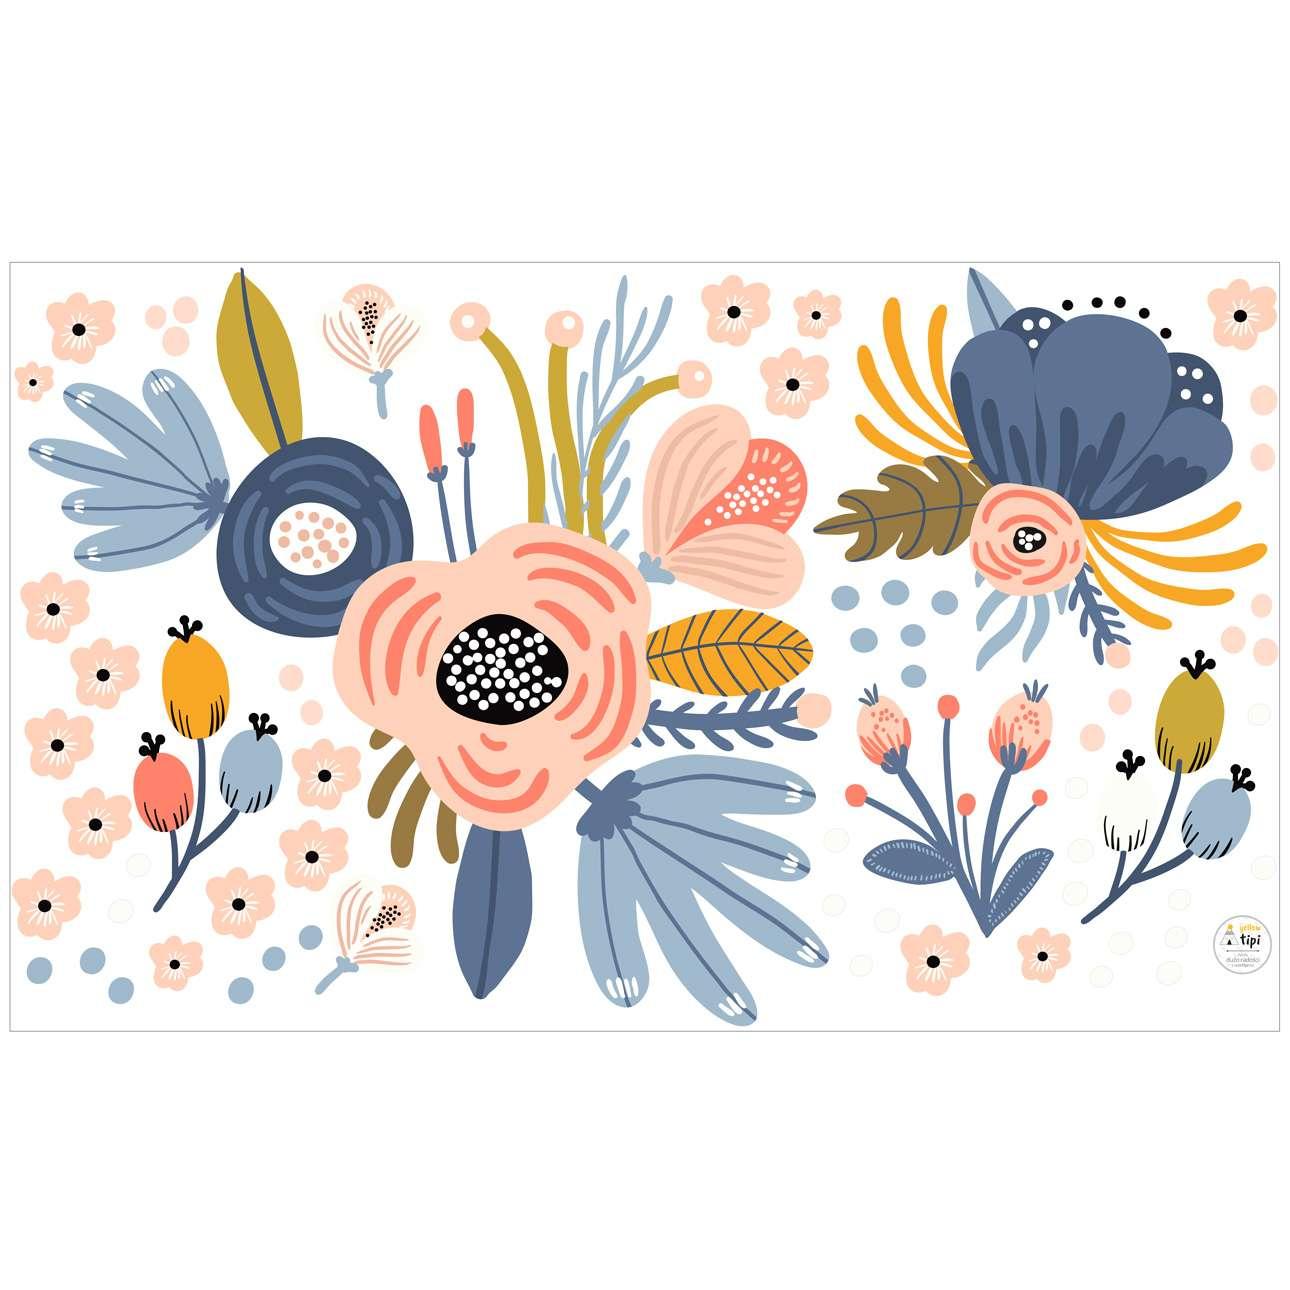 Magic Flowers sticker set